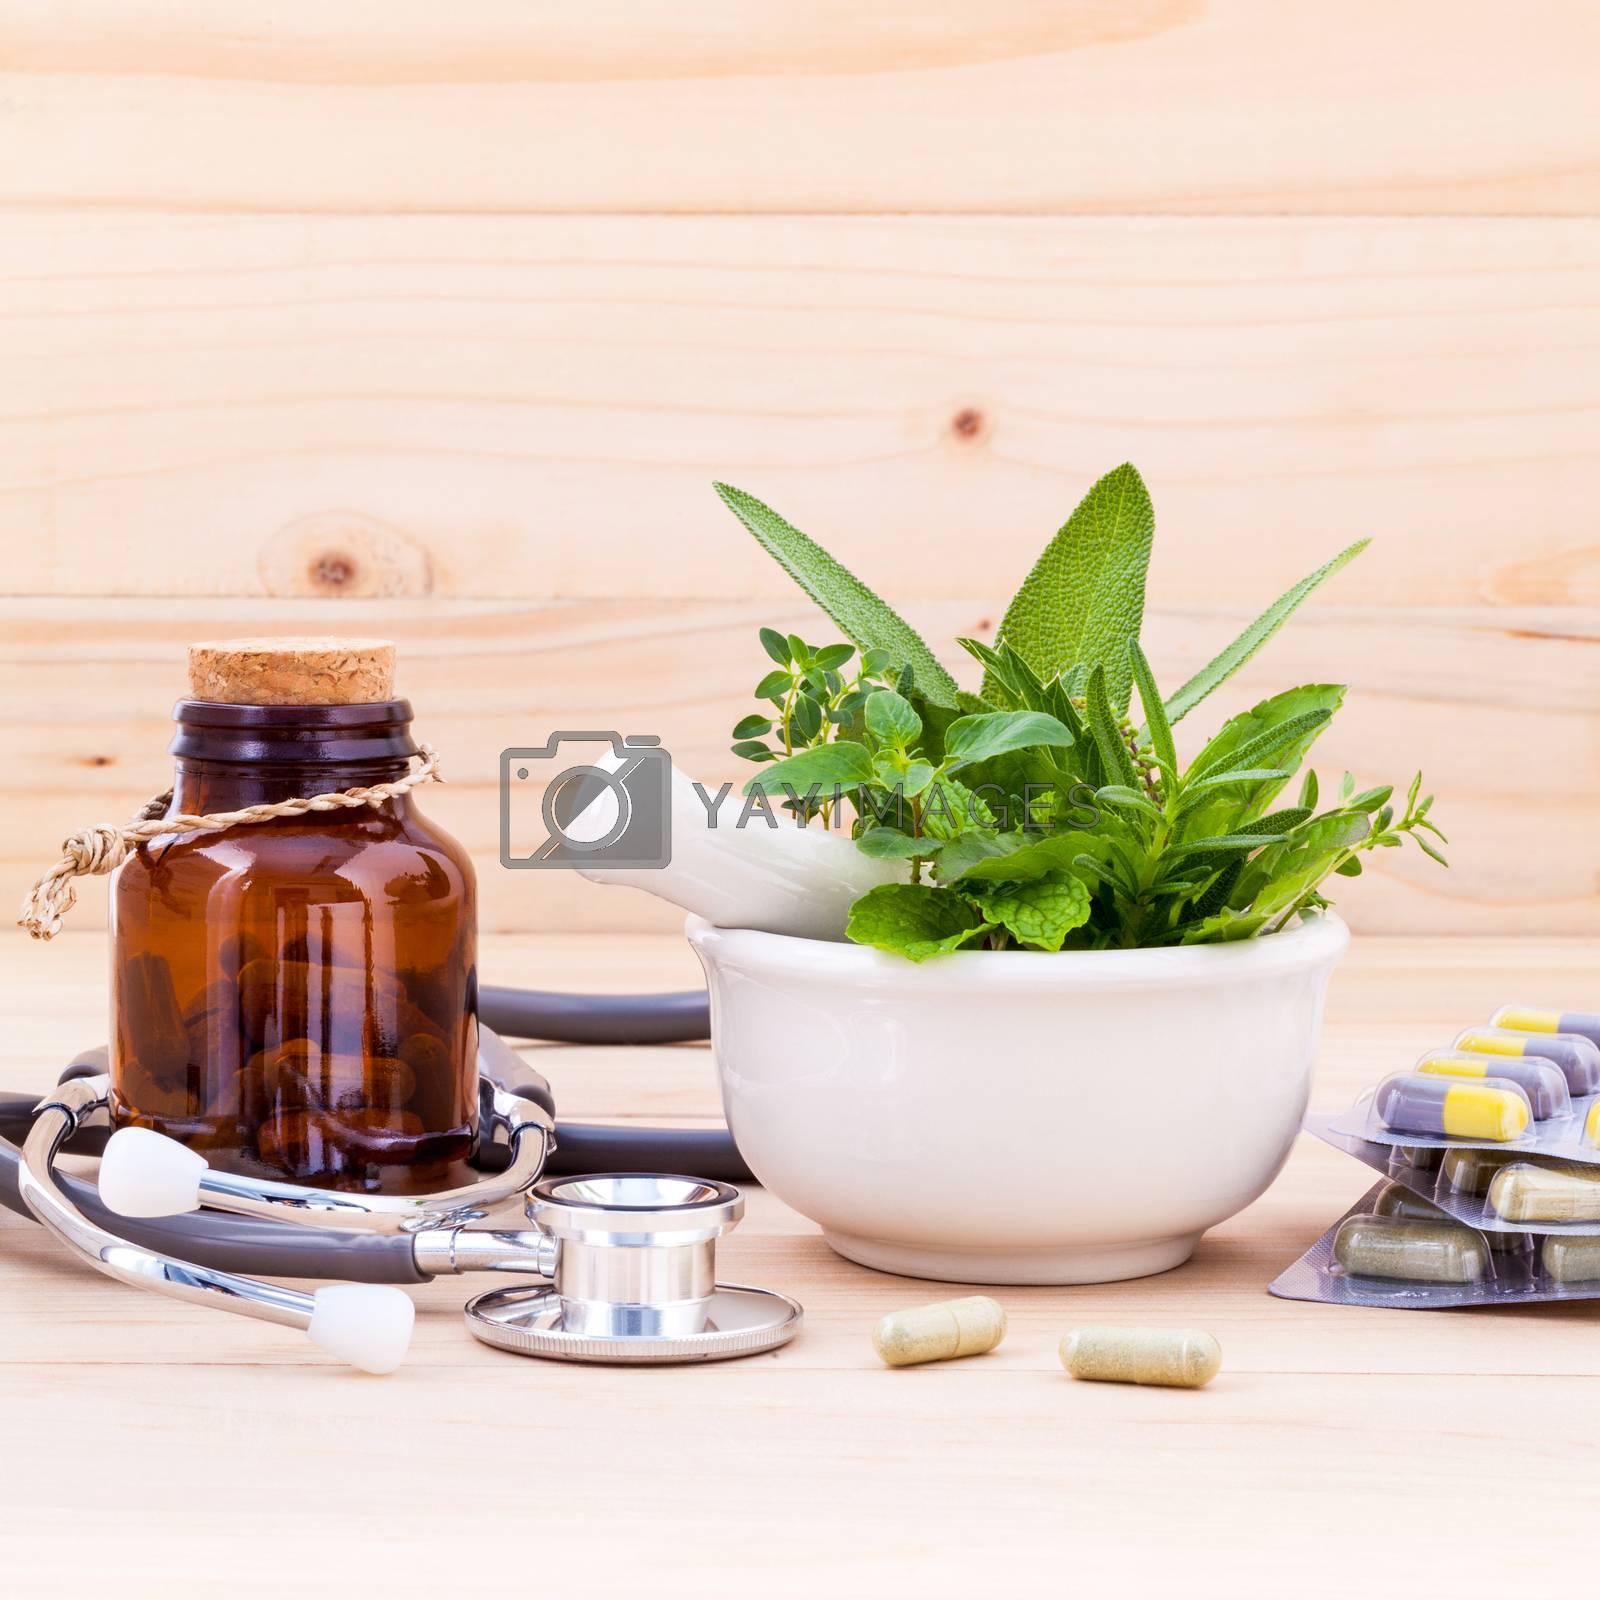 Capsule of herbal medicine alternative healthy care with stethos by kerdkanno